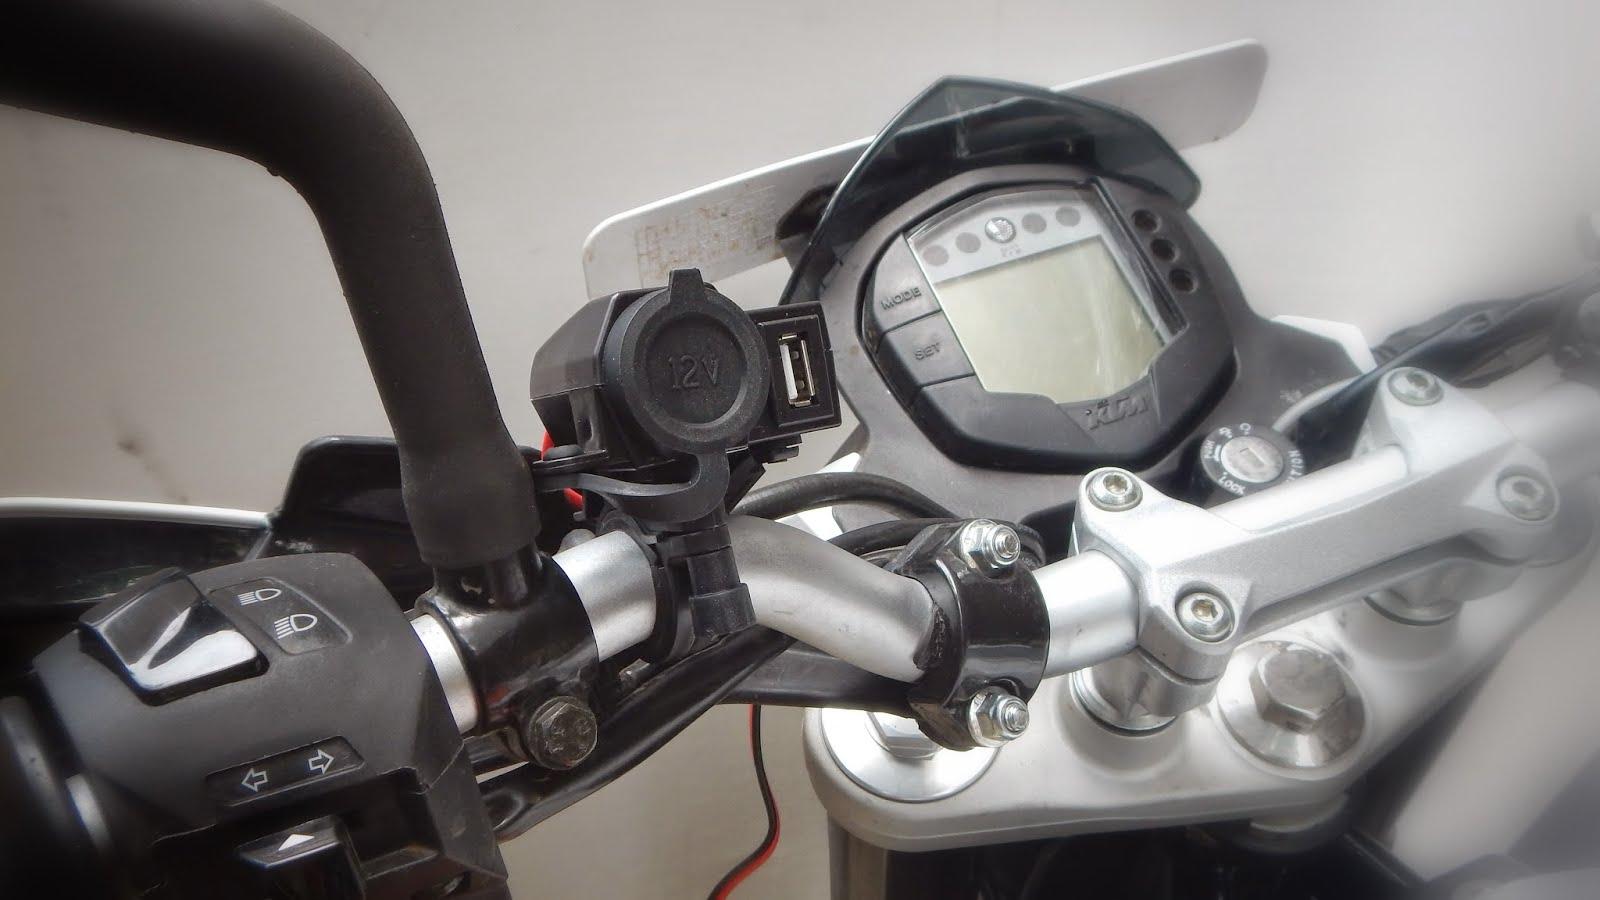 Charging accessory mounted on a Duke handlebar